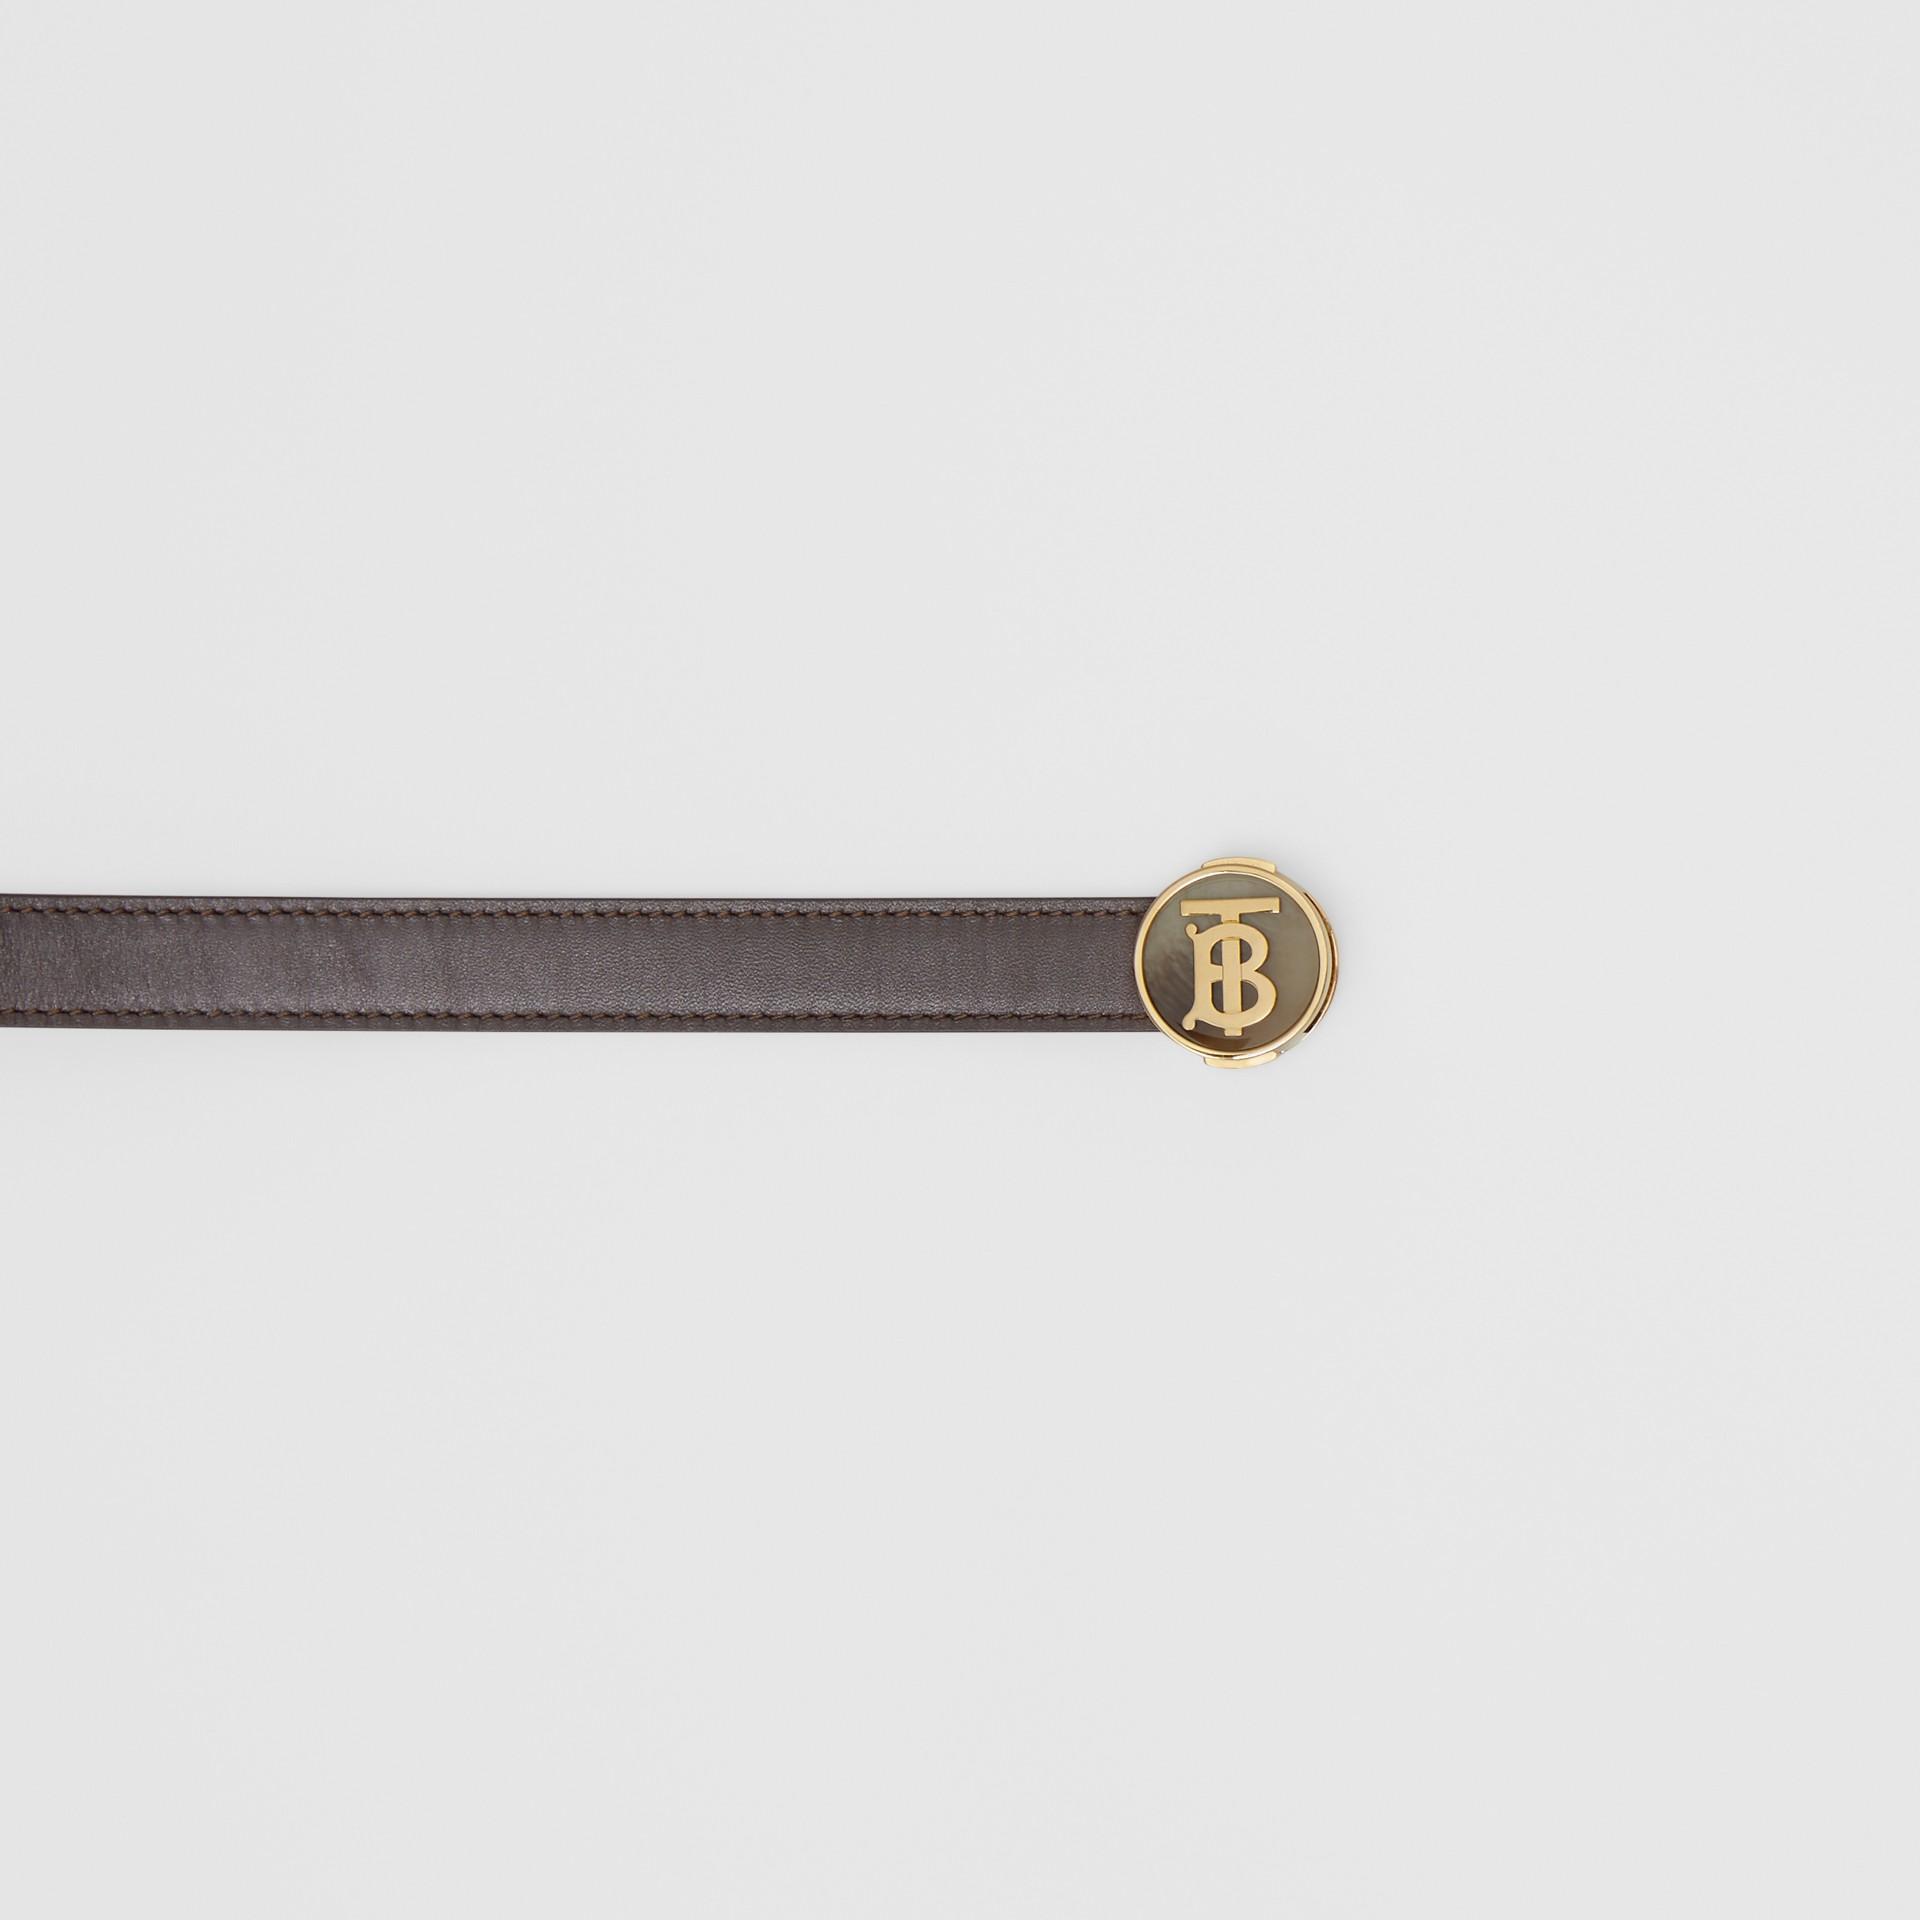 Monogram Motif Leather Belt in Deep Brown - Women | Burberry United Kingdom - gallery image 1